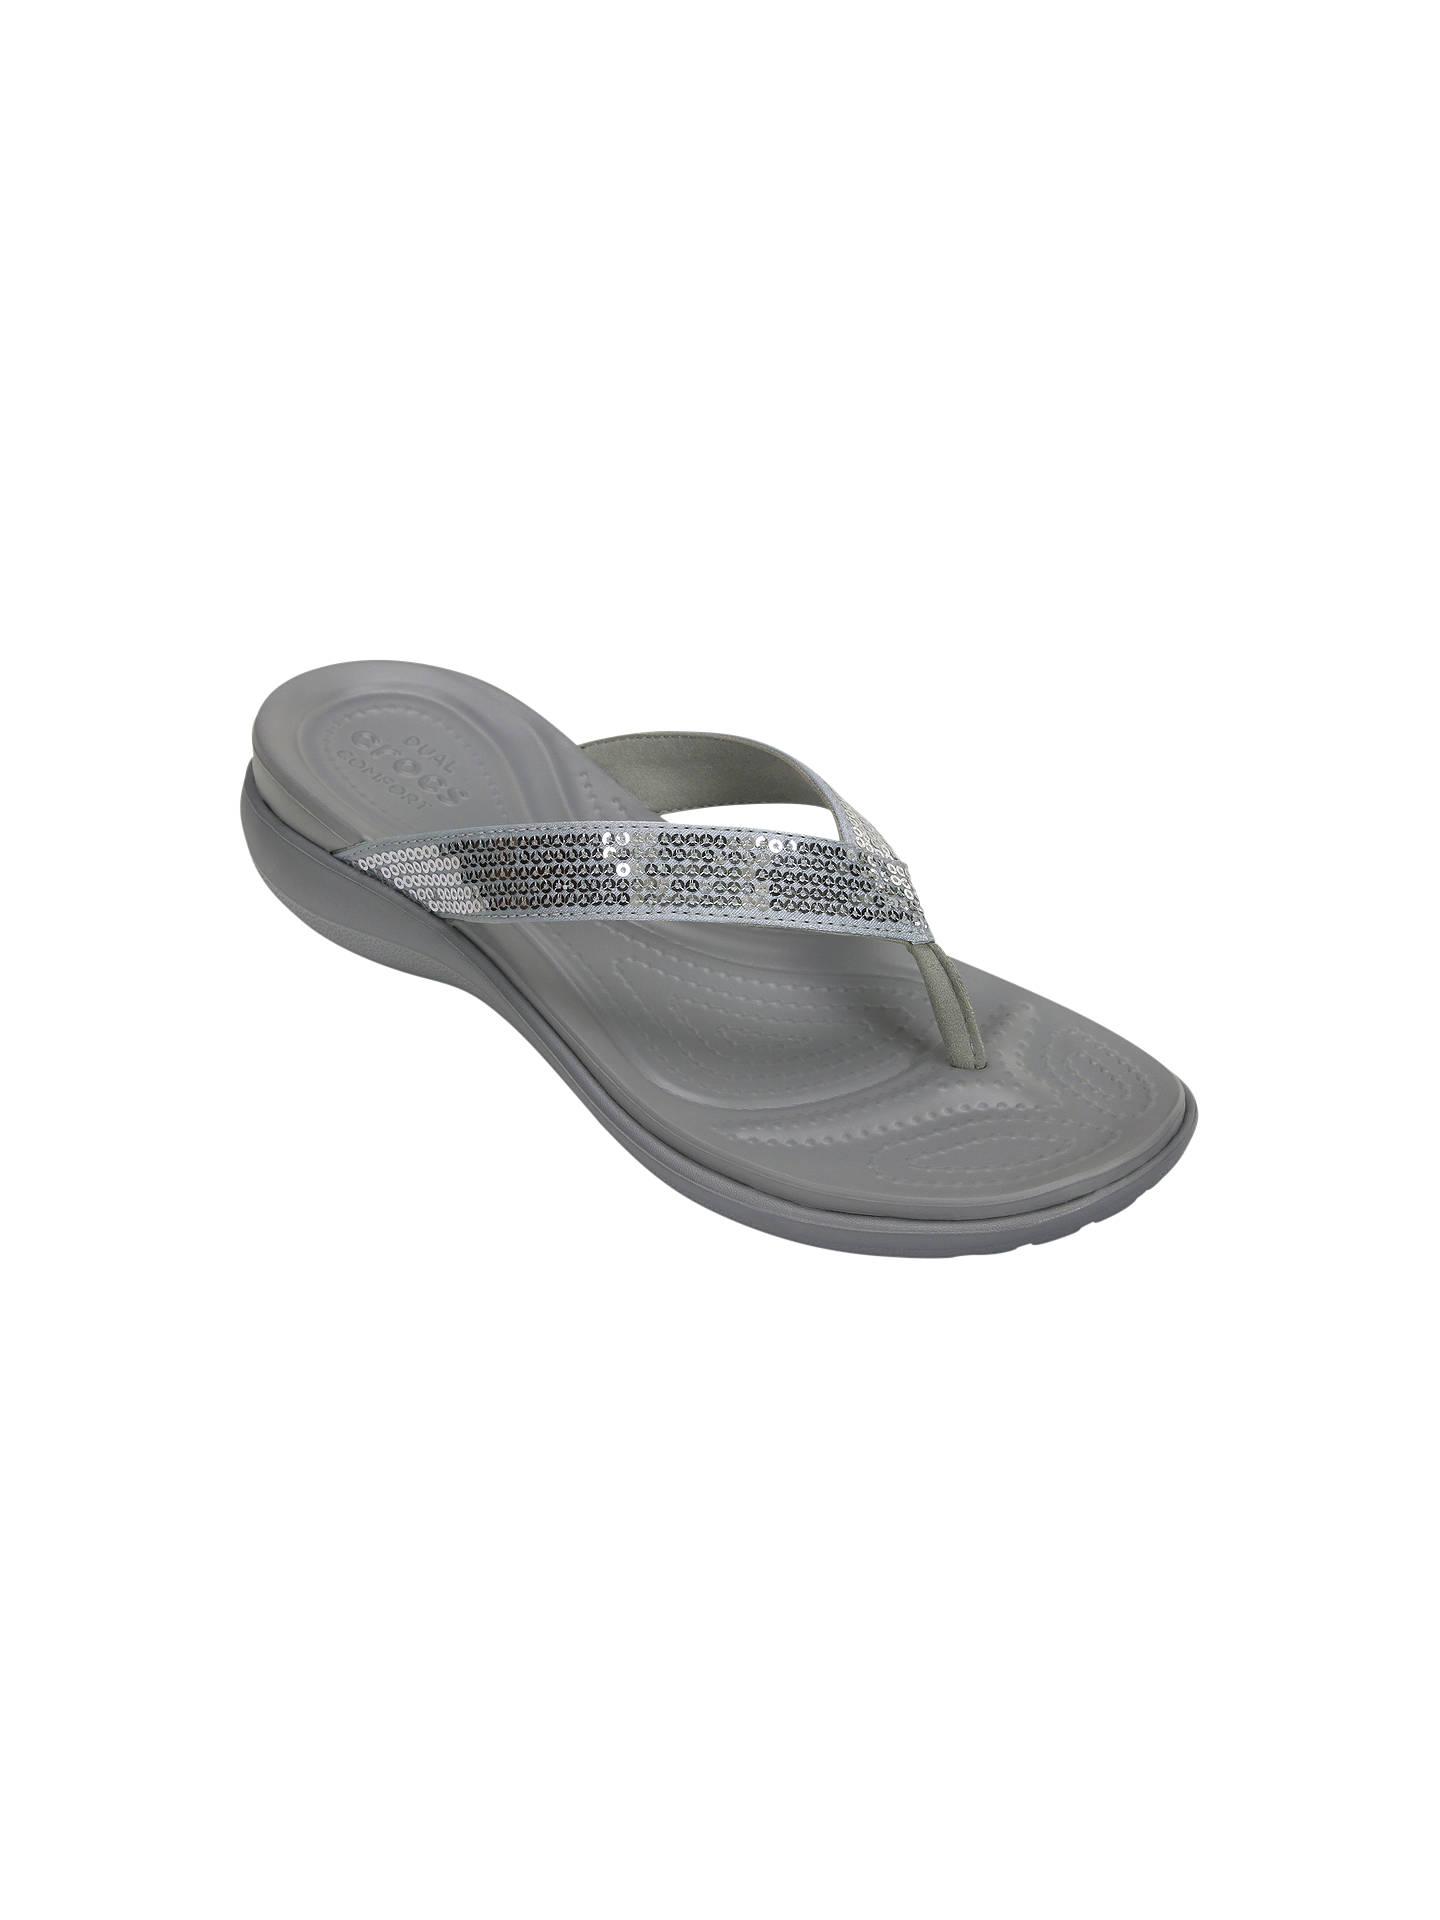 47ab1ad97 Buy Crocs Capri V Sequin Flip Flops, Silver, 4 Online at johnlewis.com ...